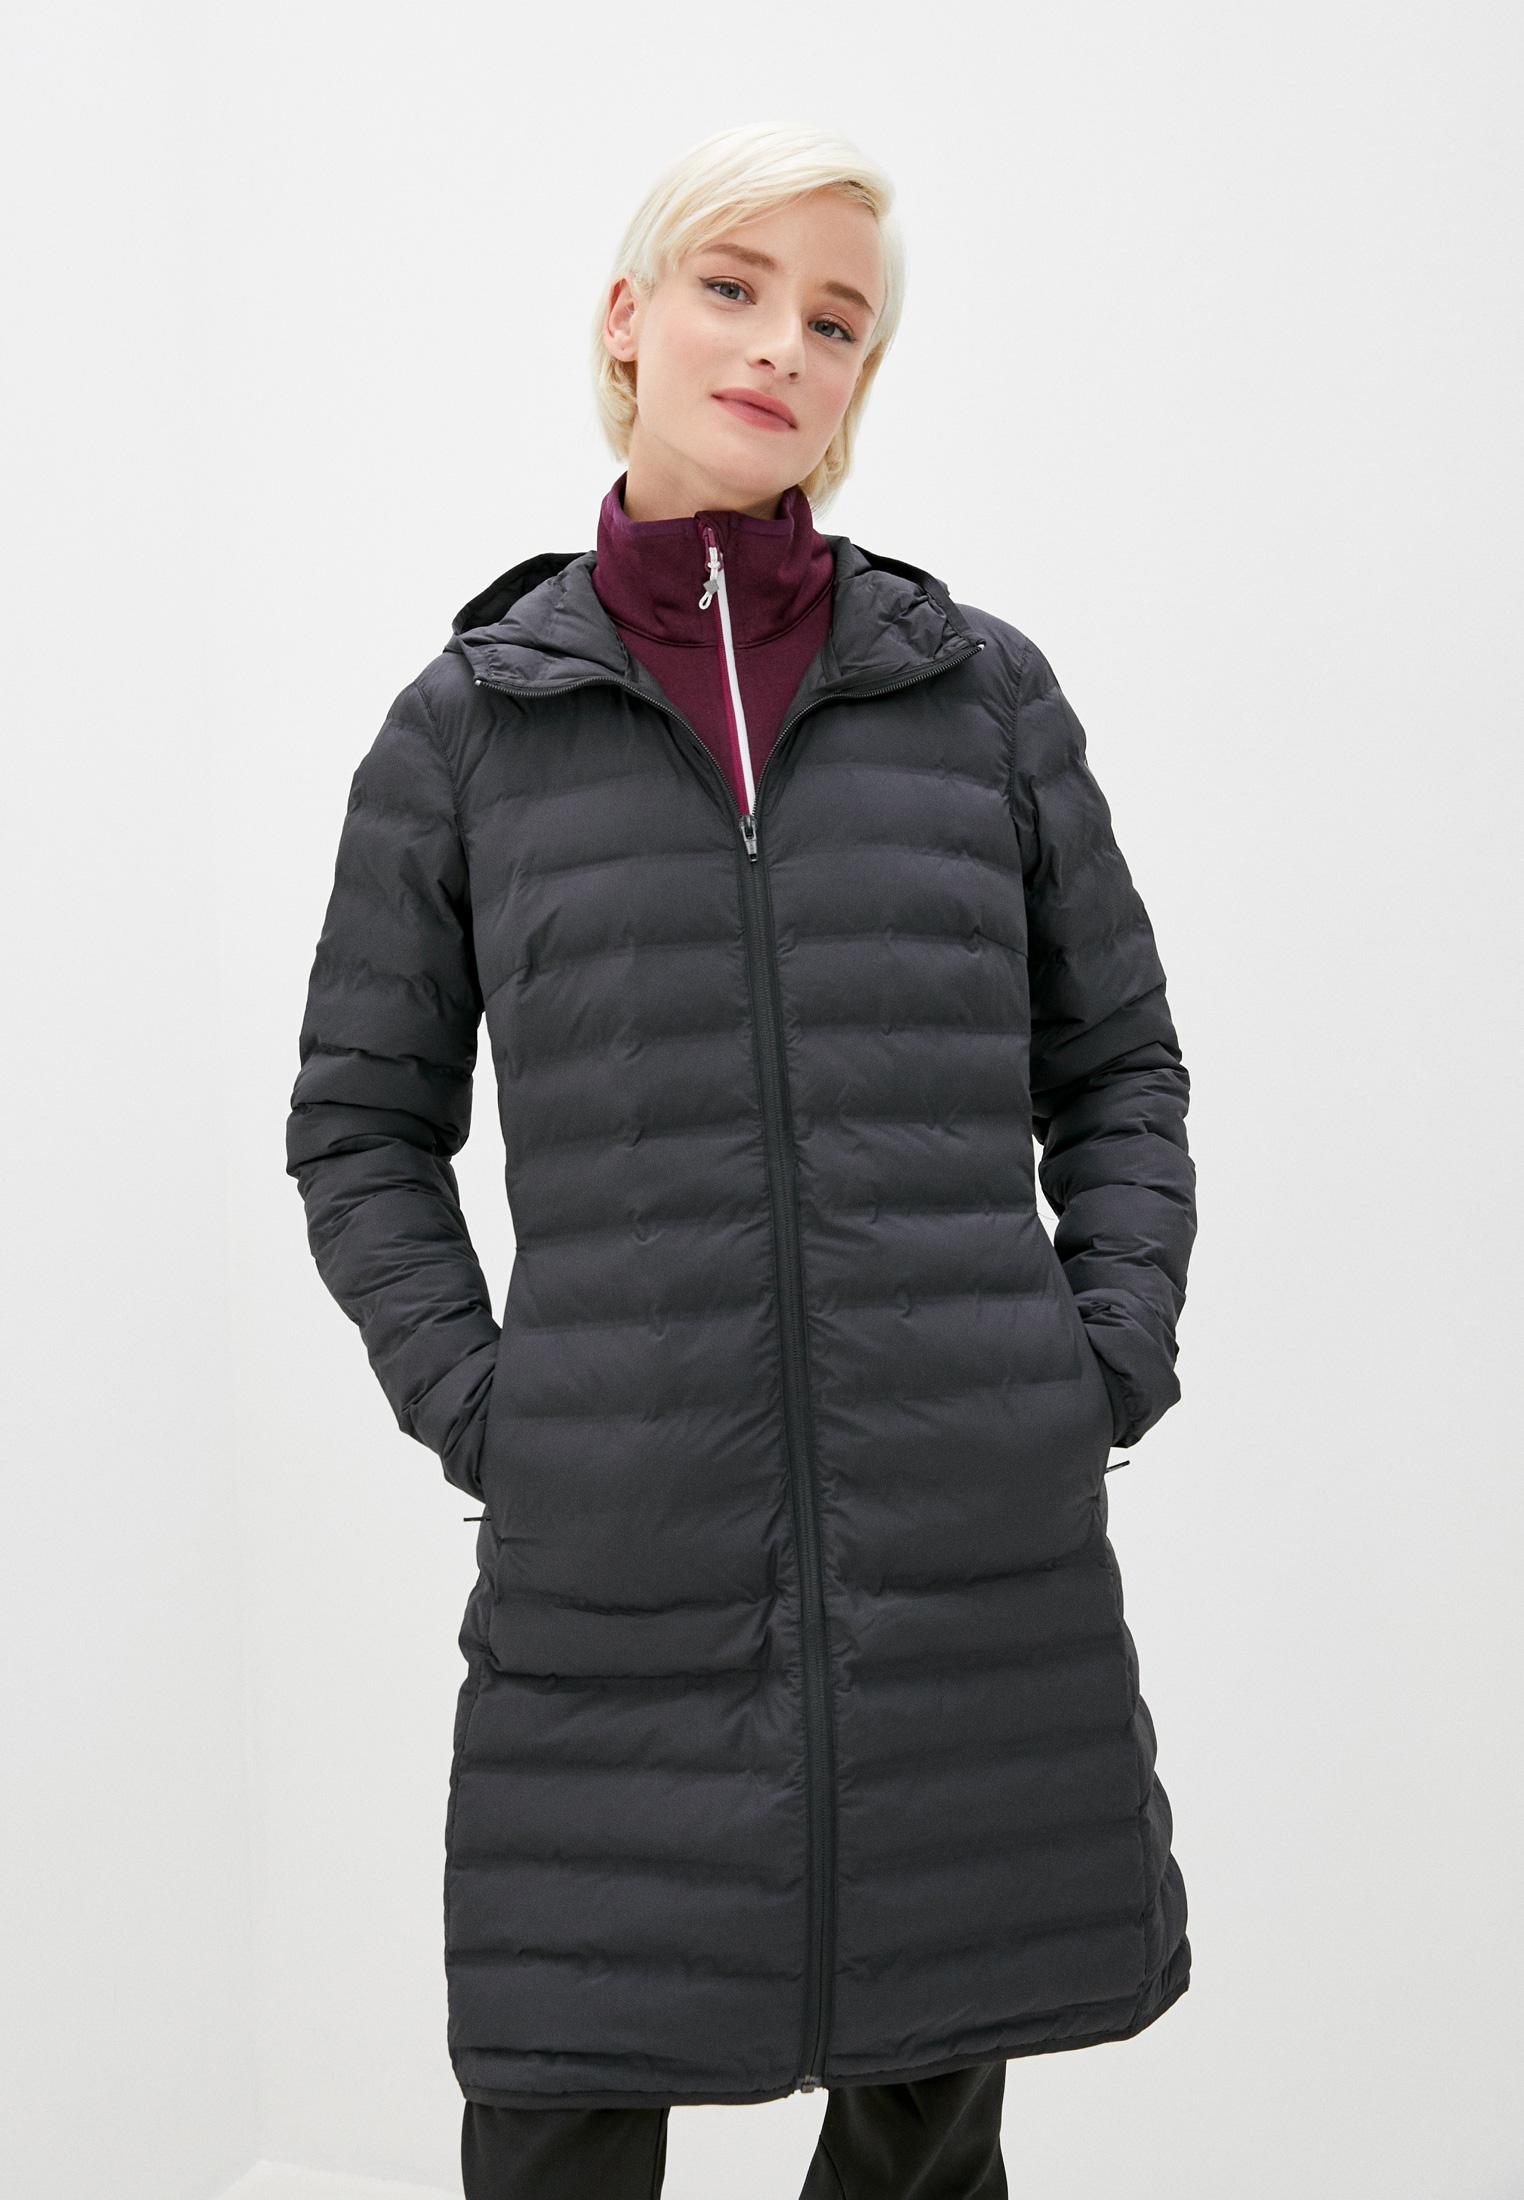 Женская верхняя одежда Helly Hansen (Хелли Хансен) 53506